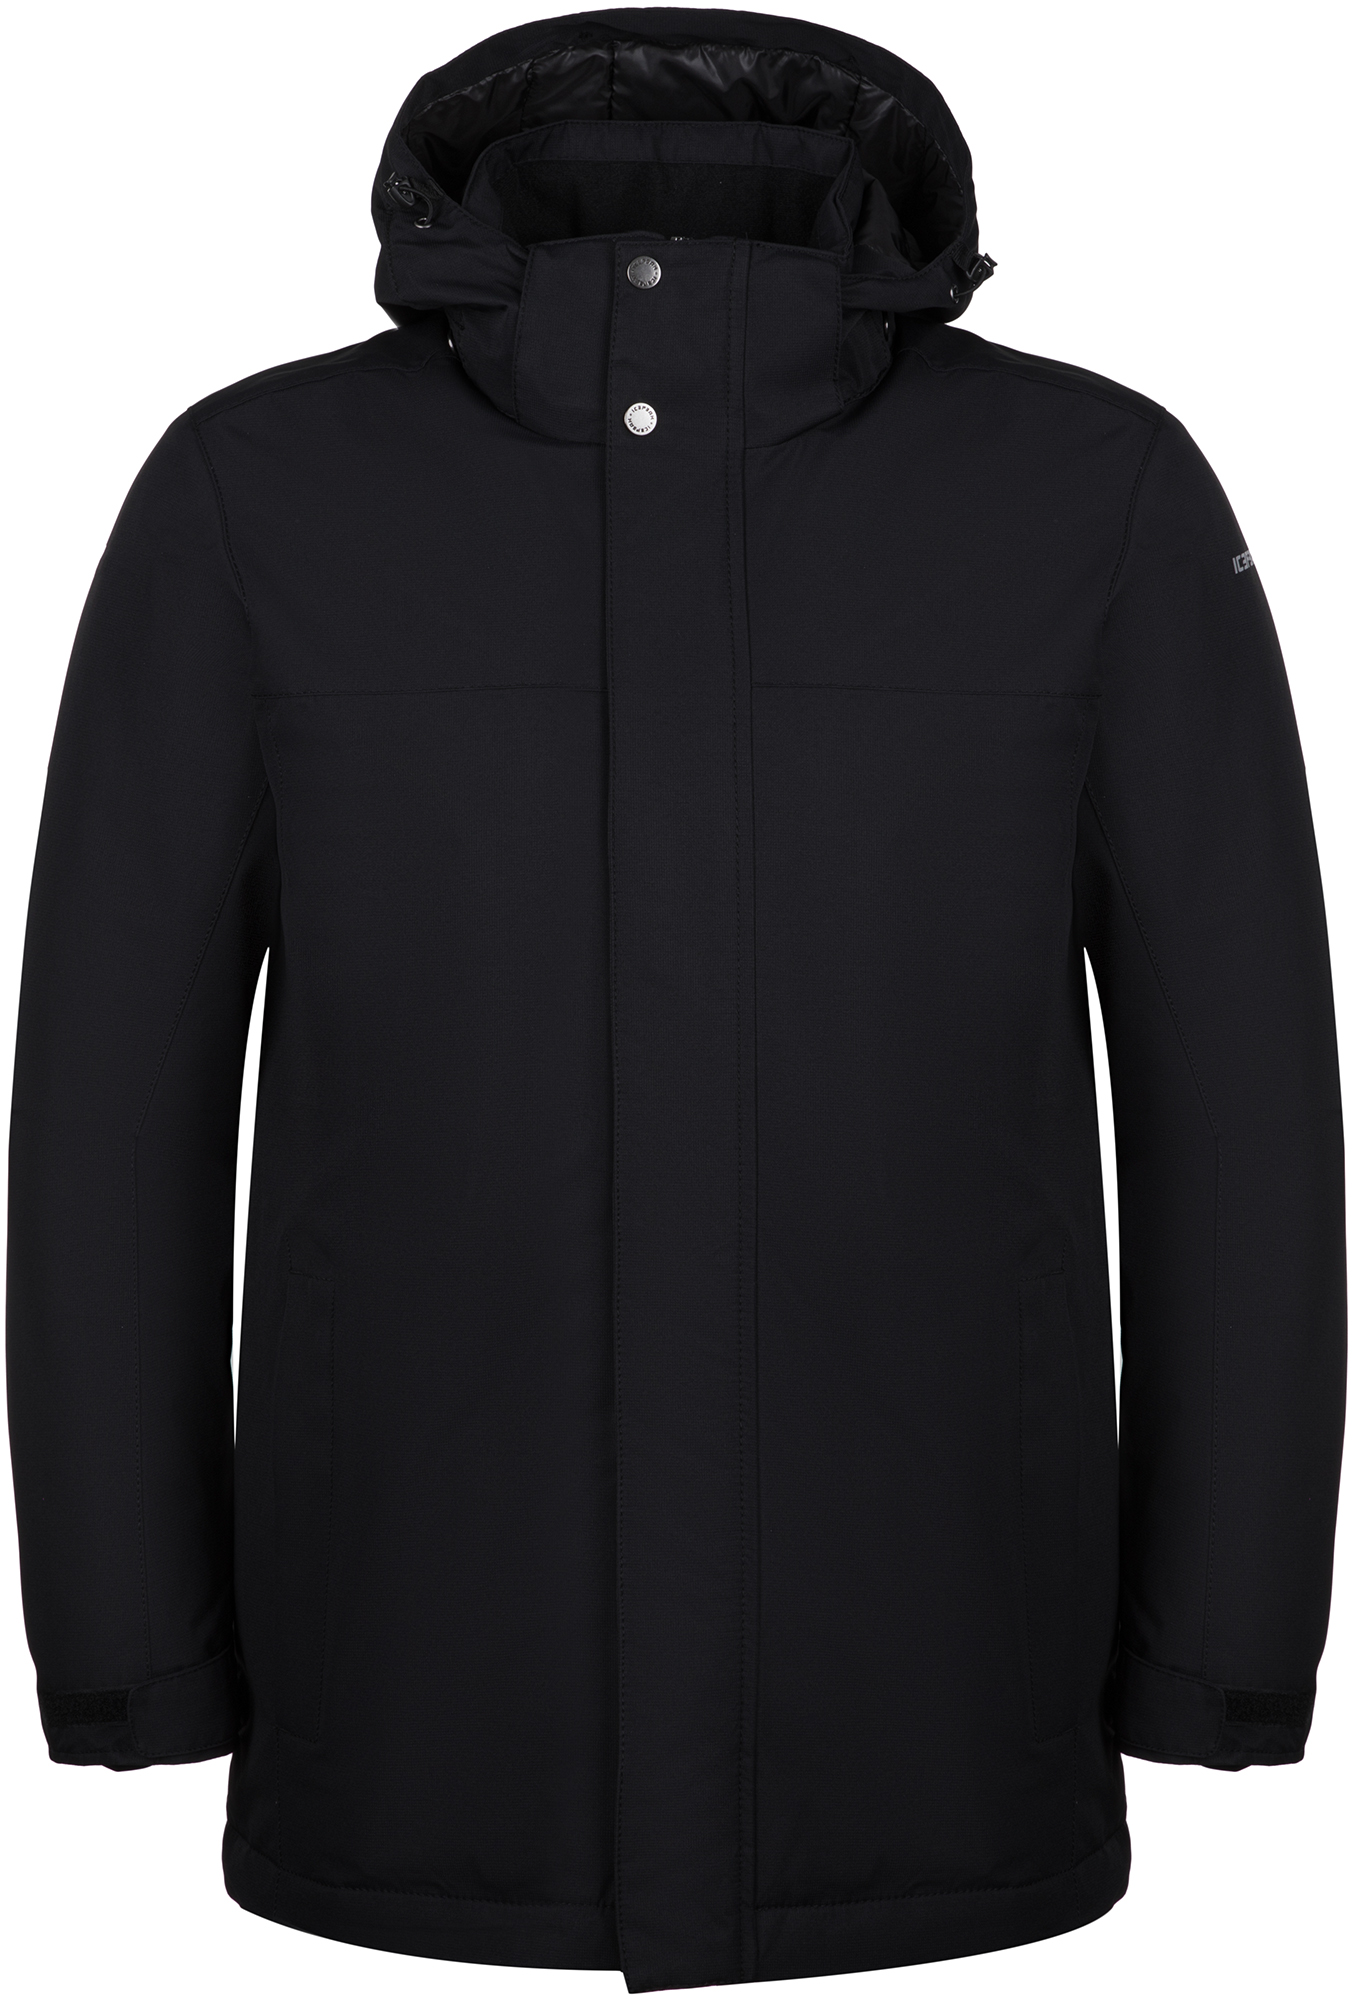 IcePeak Куртка утепленная мужская IcePeak Vanleer, размер 50 цена 2017